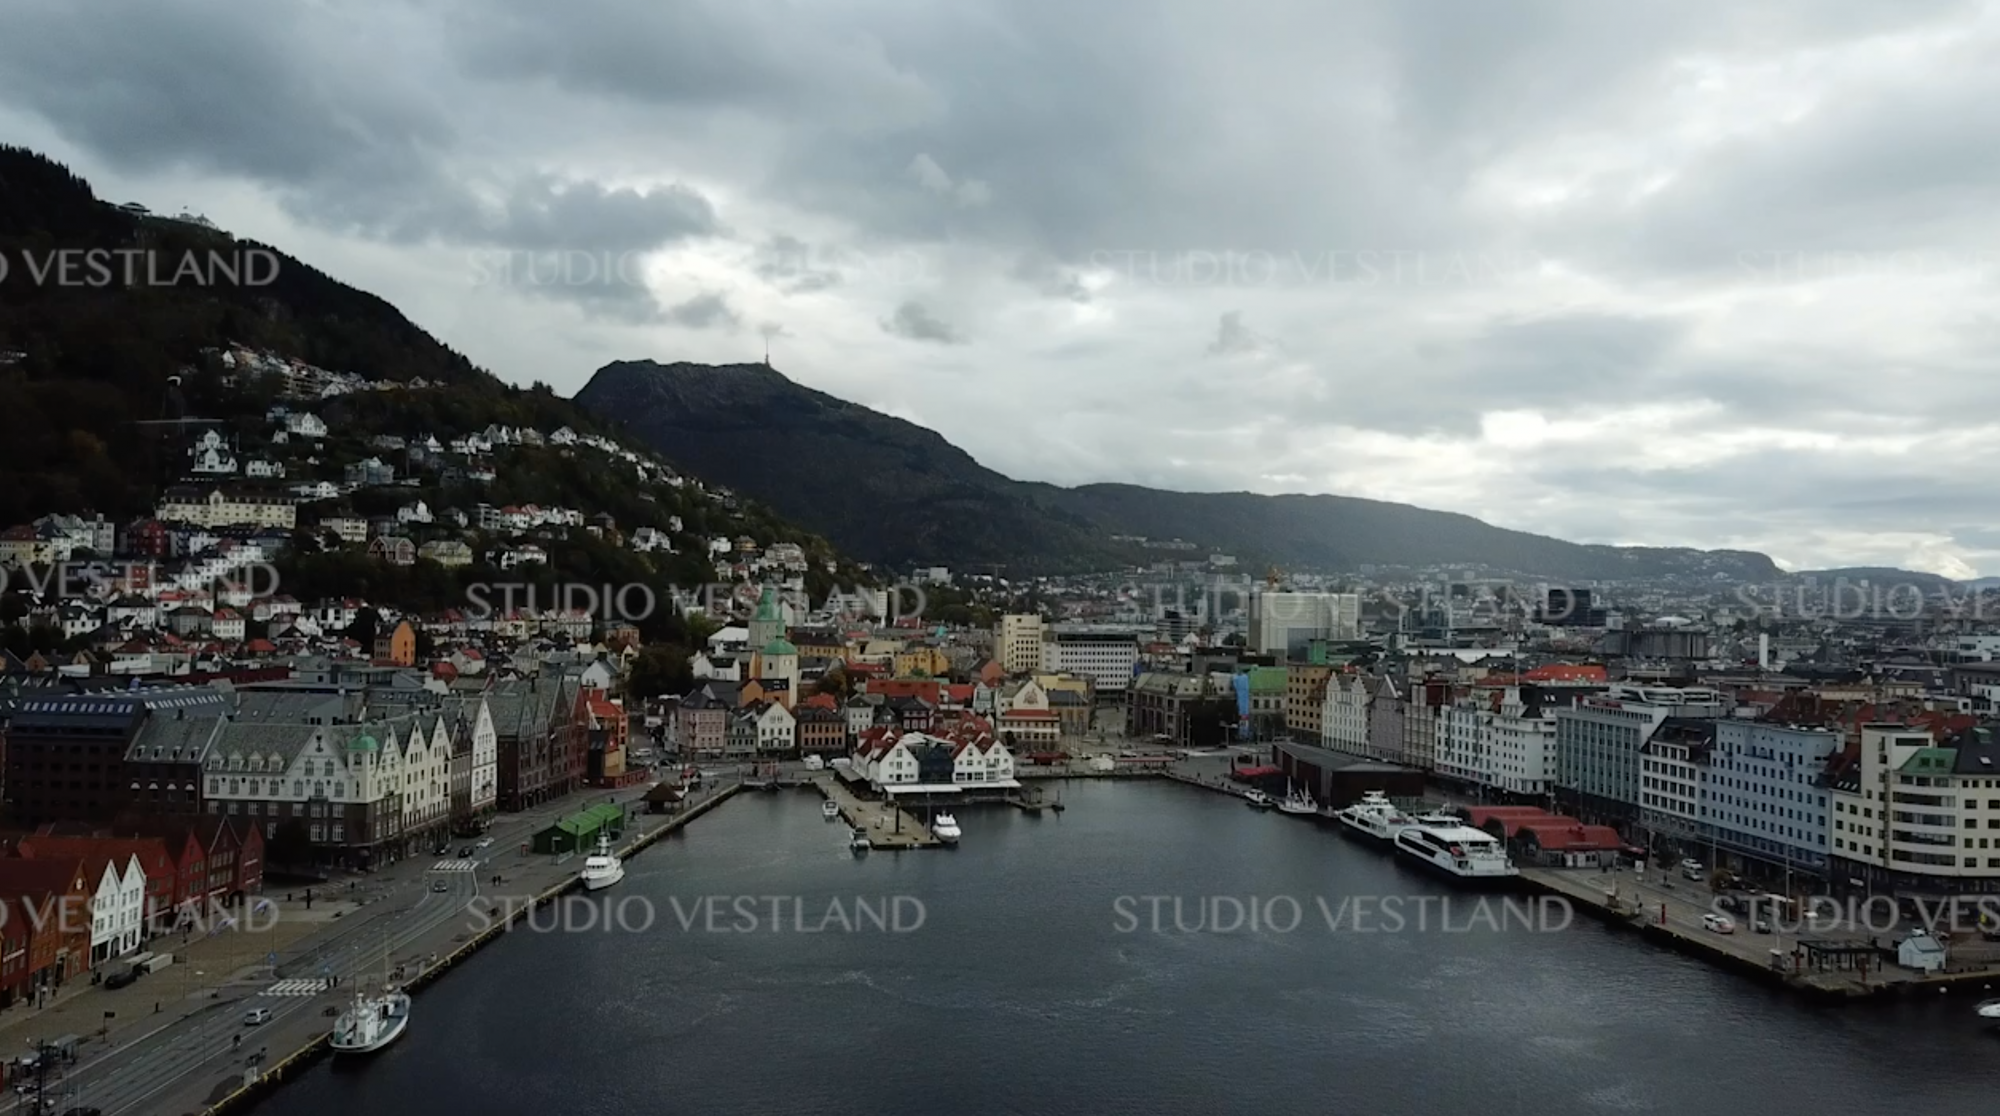 Studio Vestland - Bergen V13